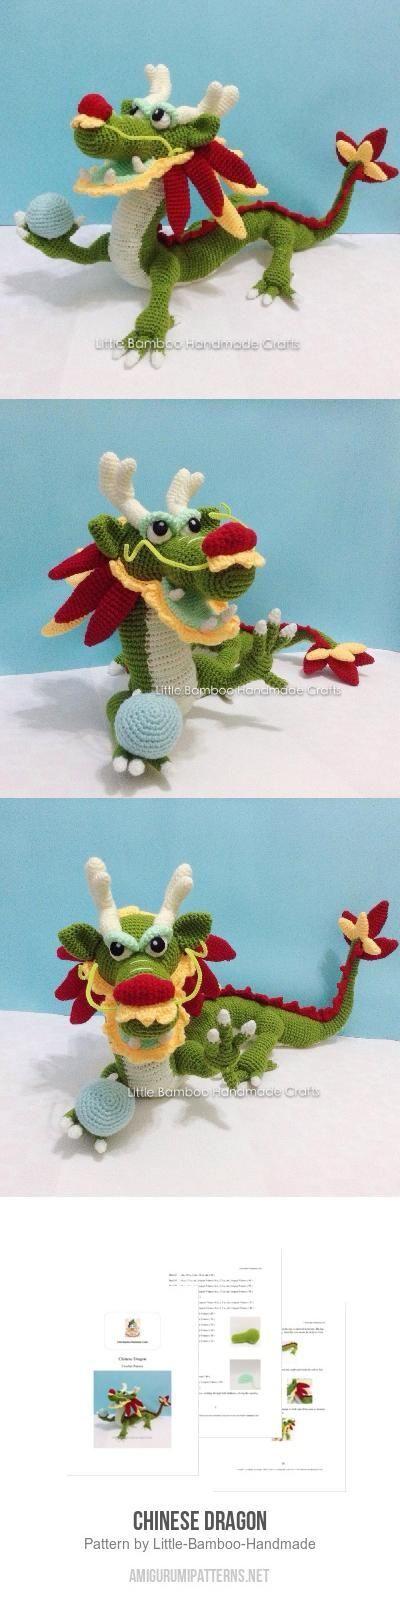 Amigurumi Chinese Dragon : Chinese dragon amigurumi pattern by Little Bamboo Handmade ...